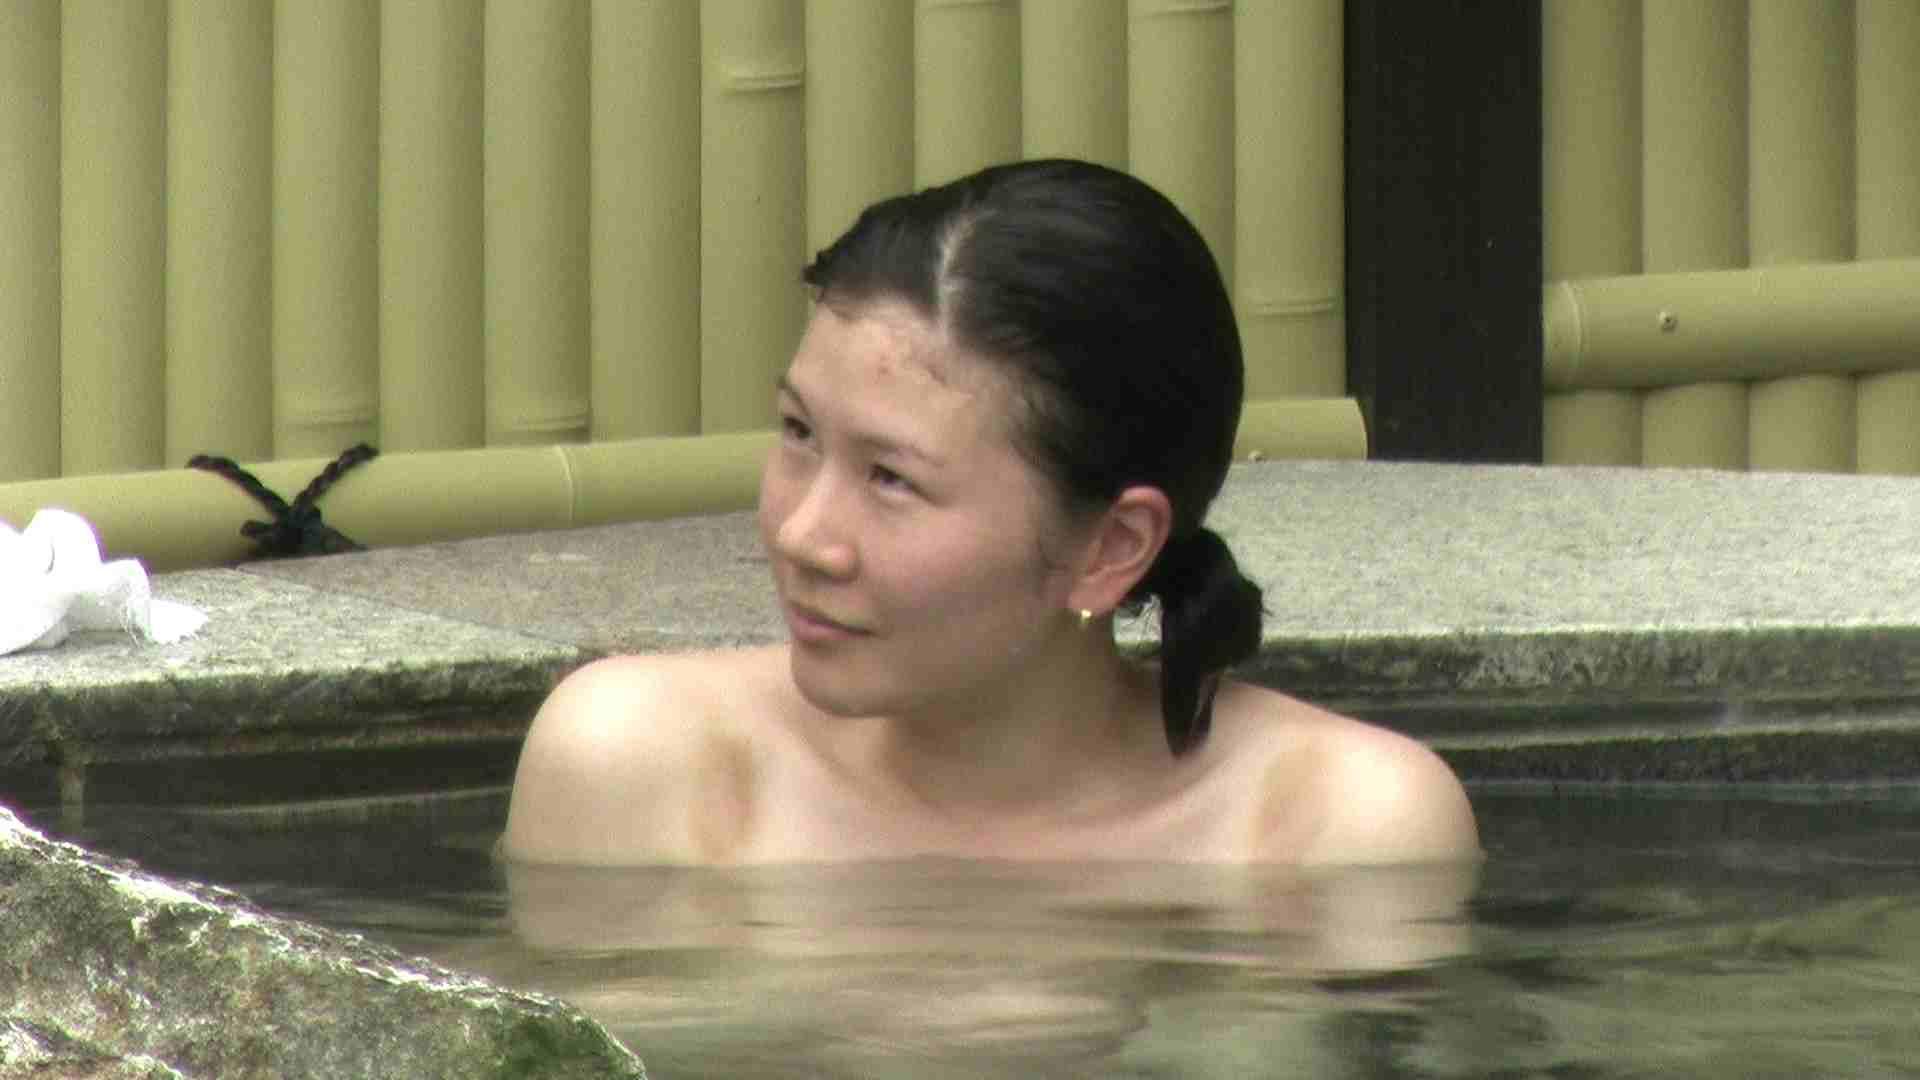 Aquaな露天風呂Vol.187 盗撮   HなOL  96pic 39